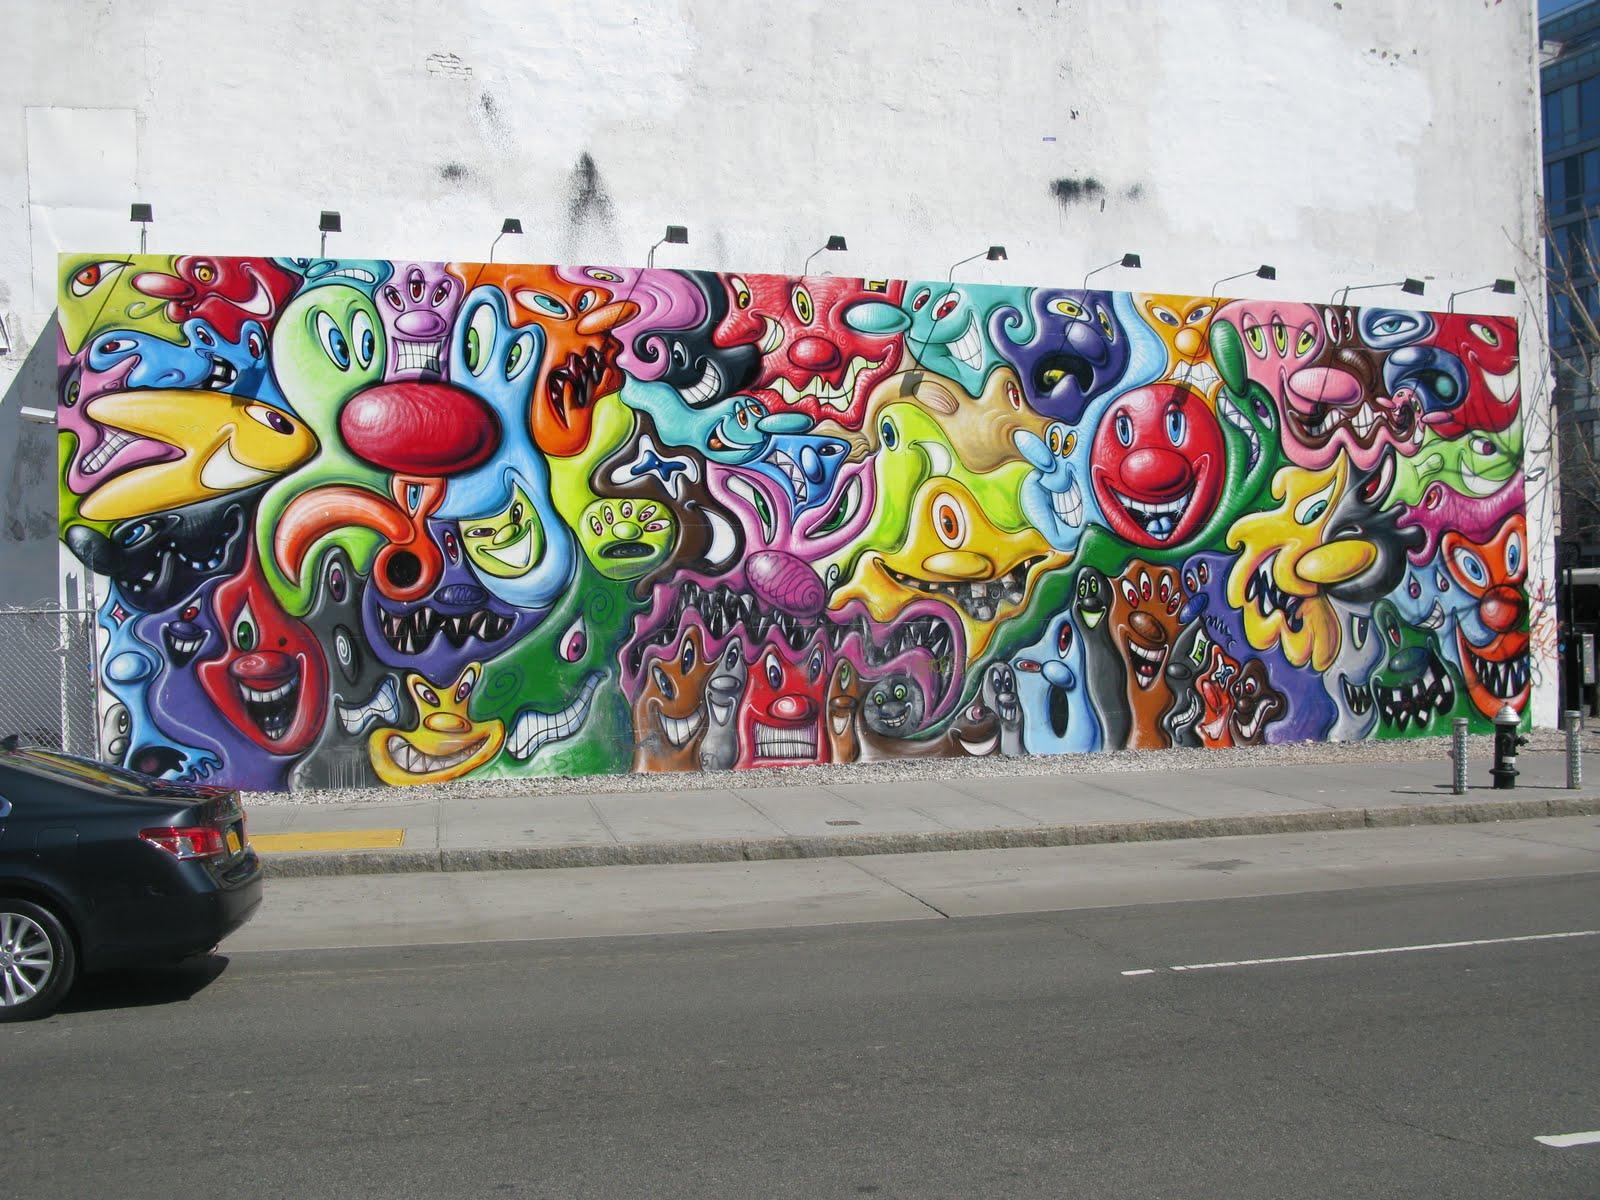 At149st New York City Graffiti Vs Street Art 2